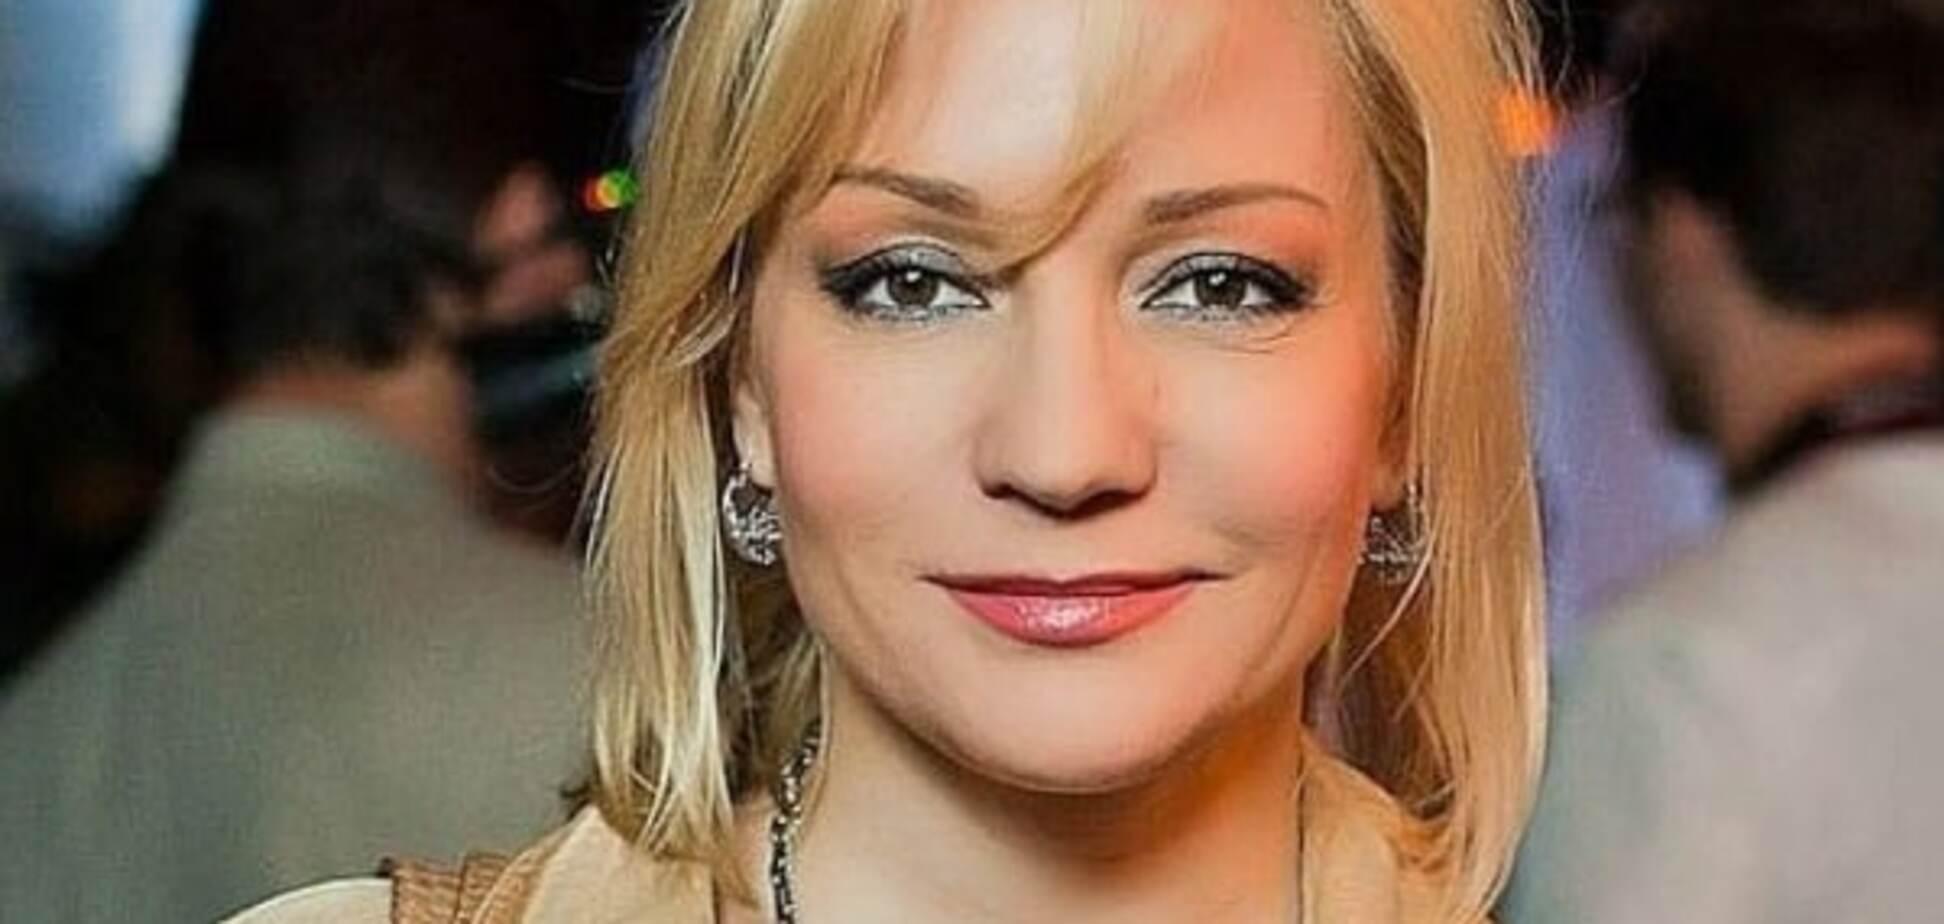 Татьяна Буланова рассказала о муже-гее